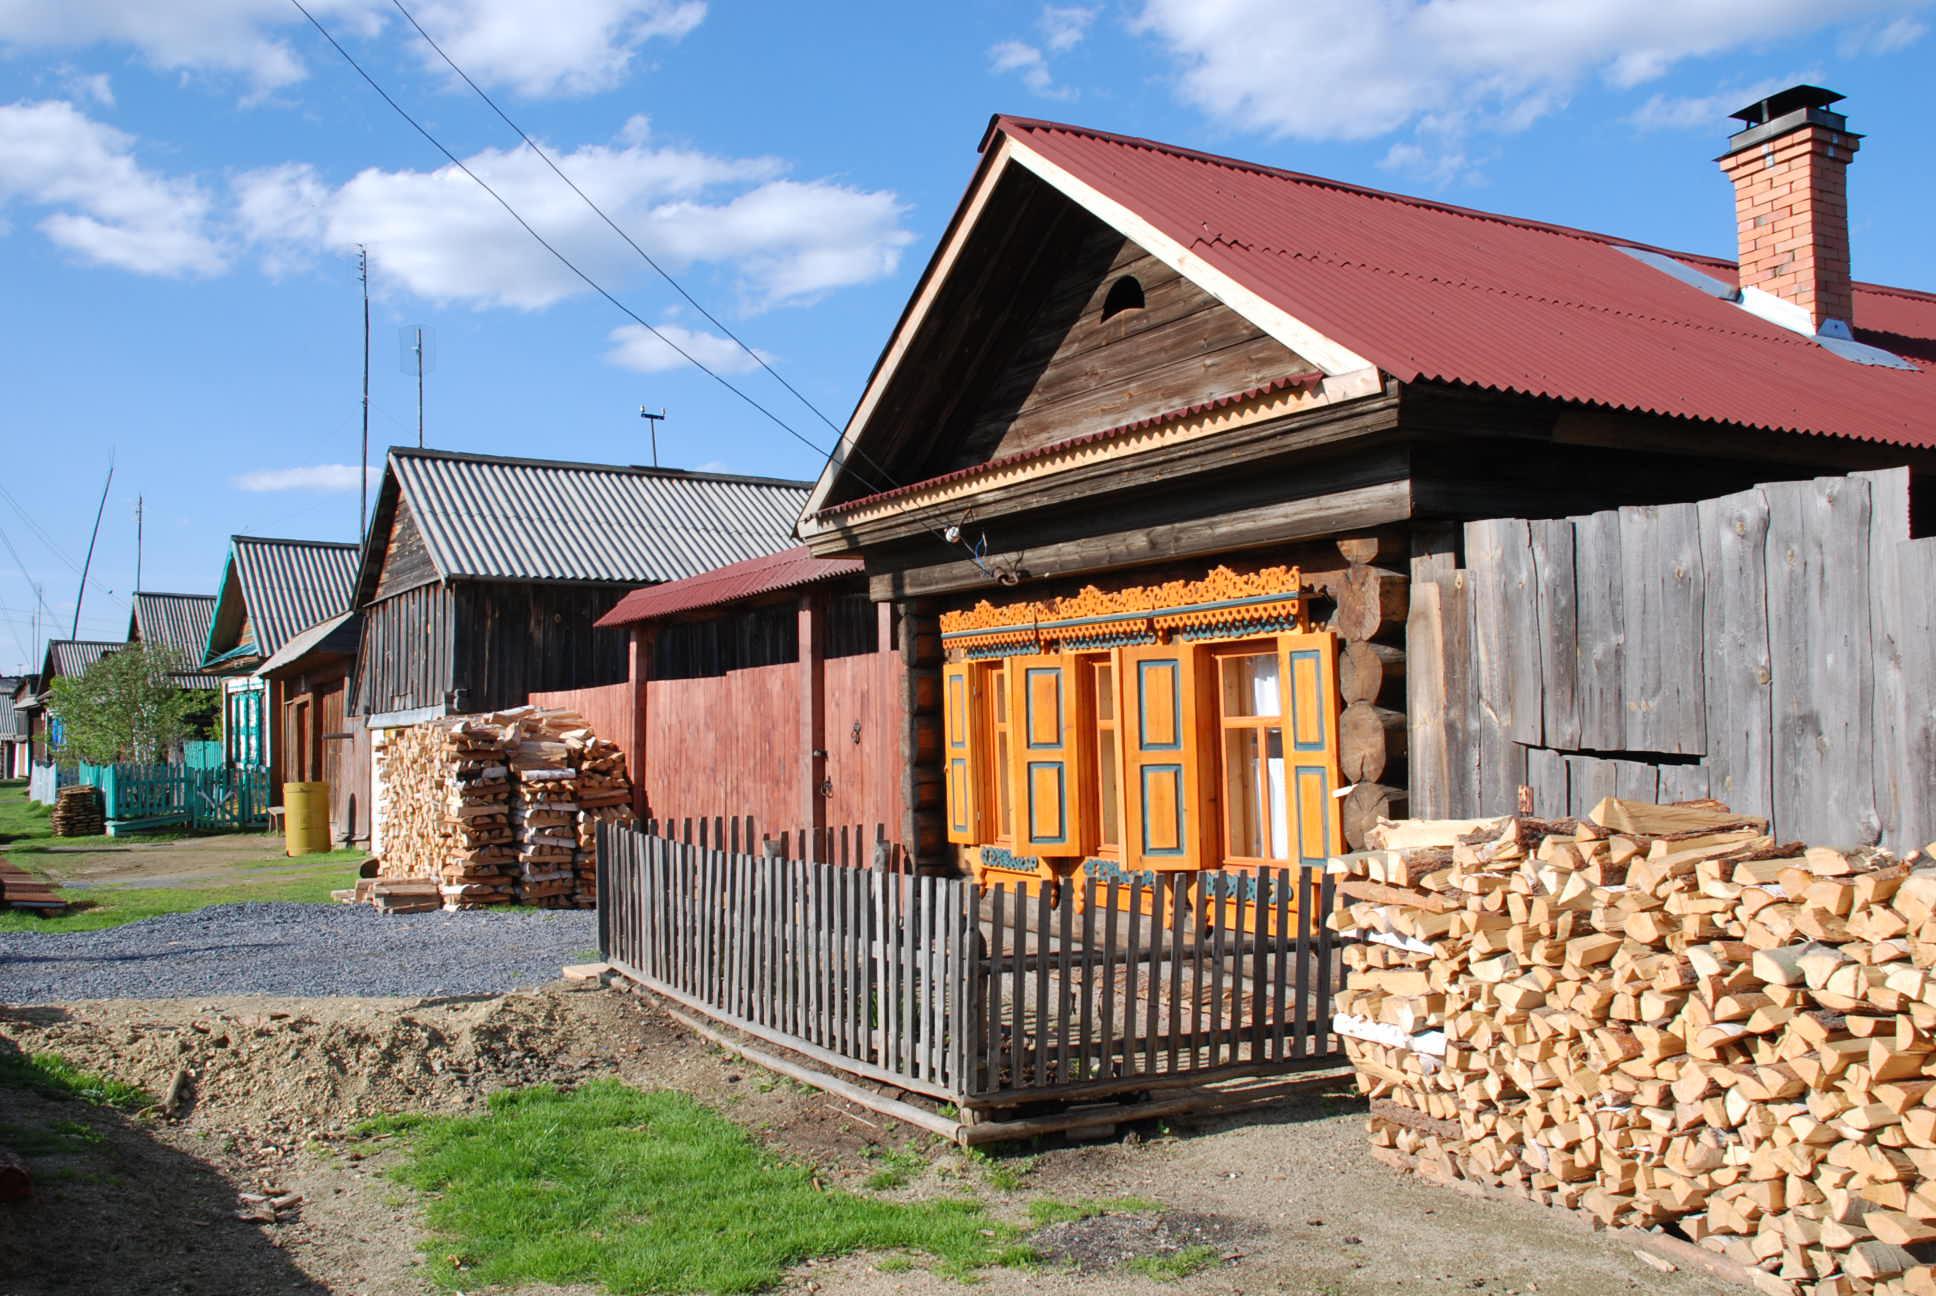 Bingi - unser Haus im Ural bei Jekateriburg